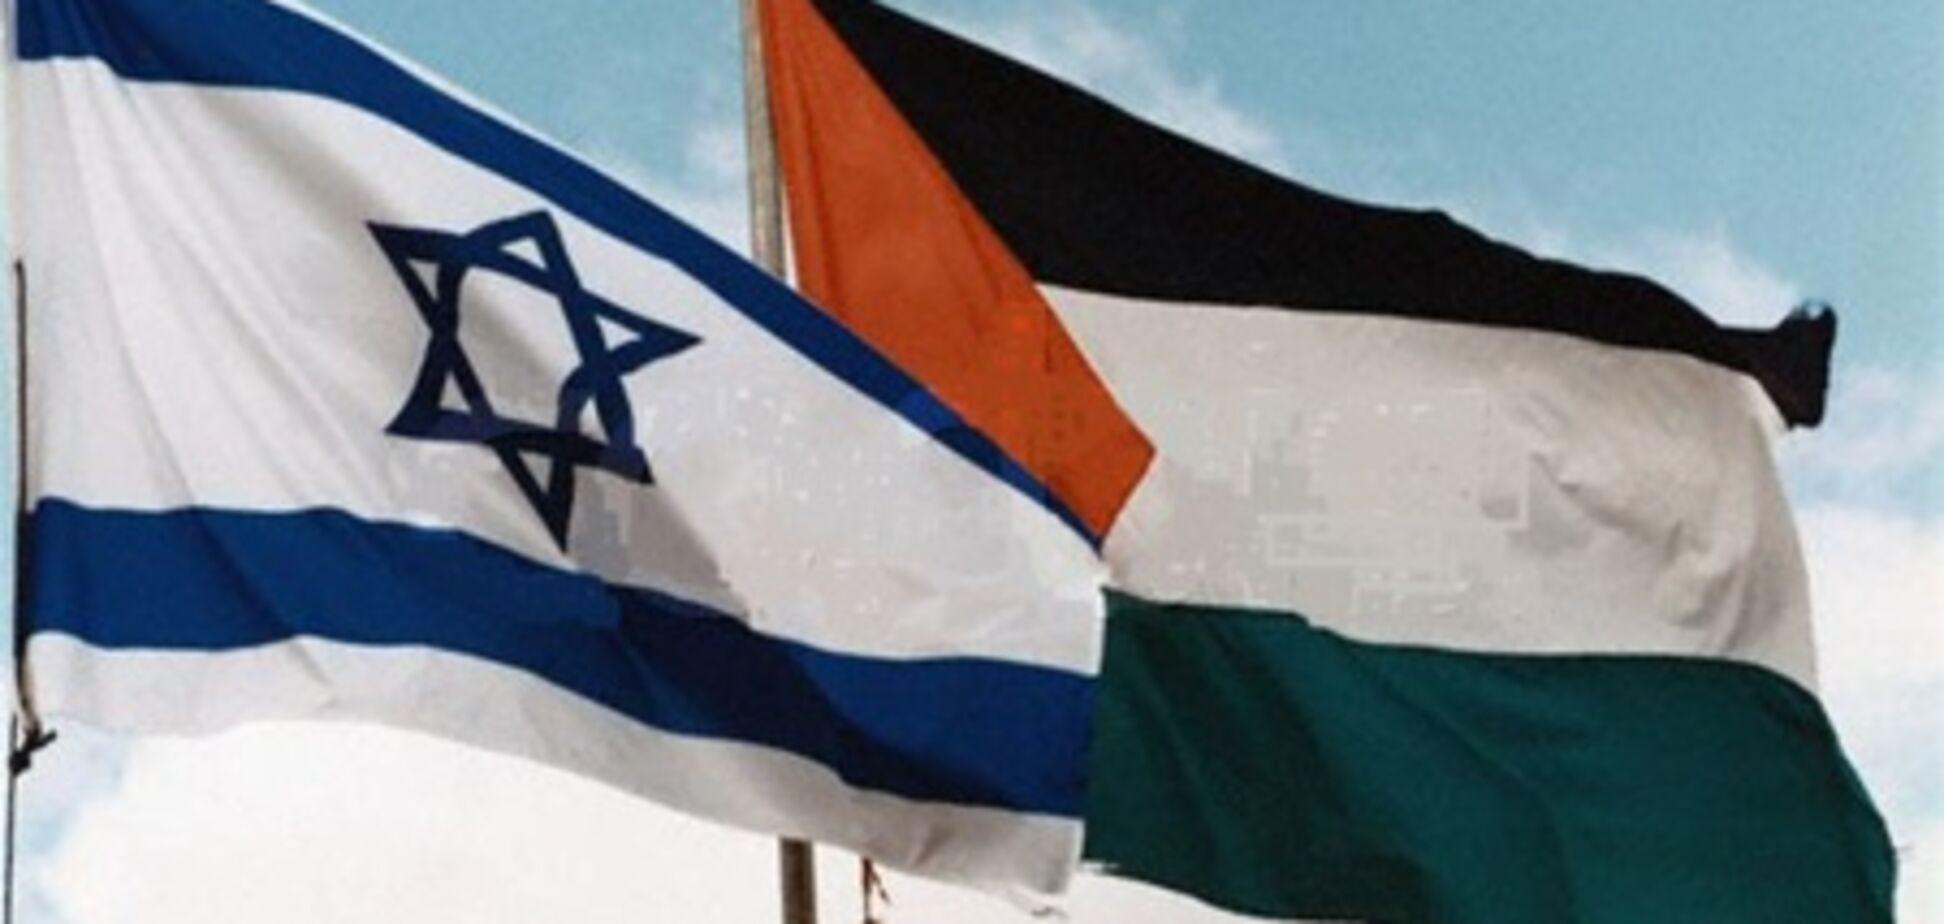 Хаменеи просит ХАМАС не идти на компромисс с Израилем